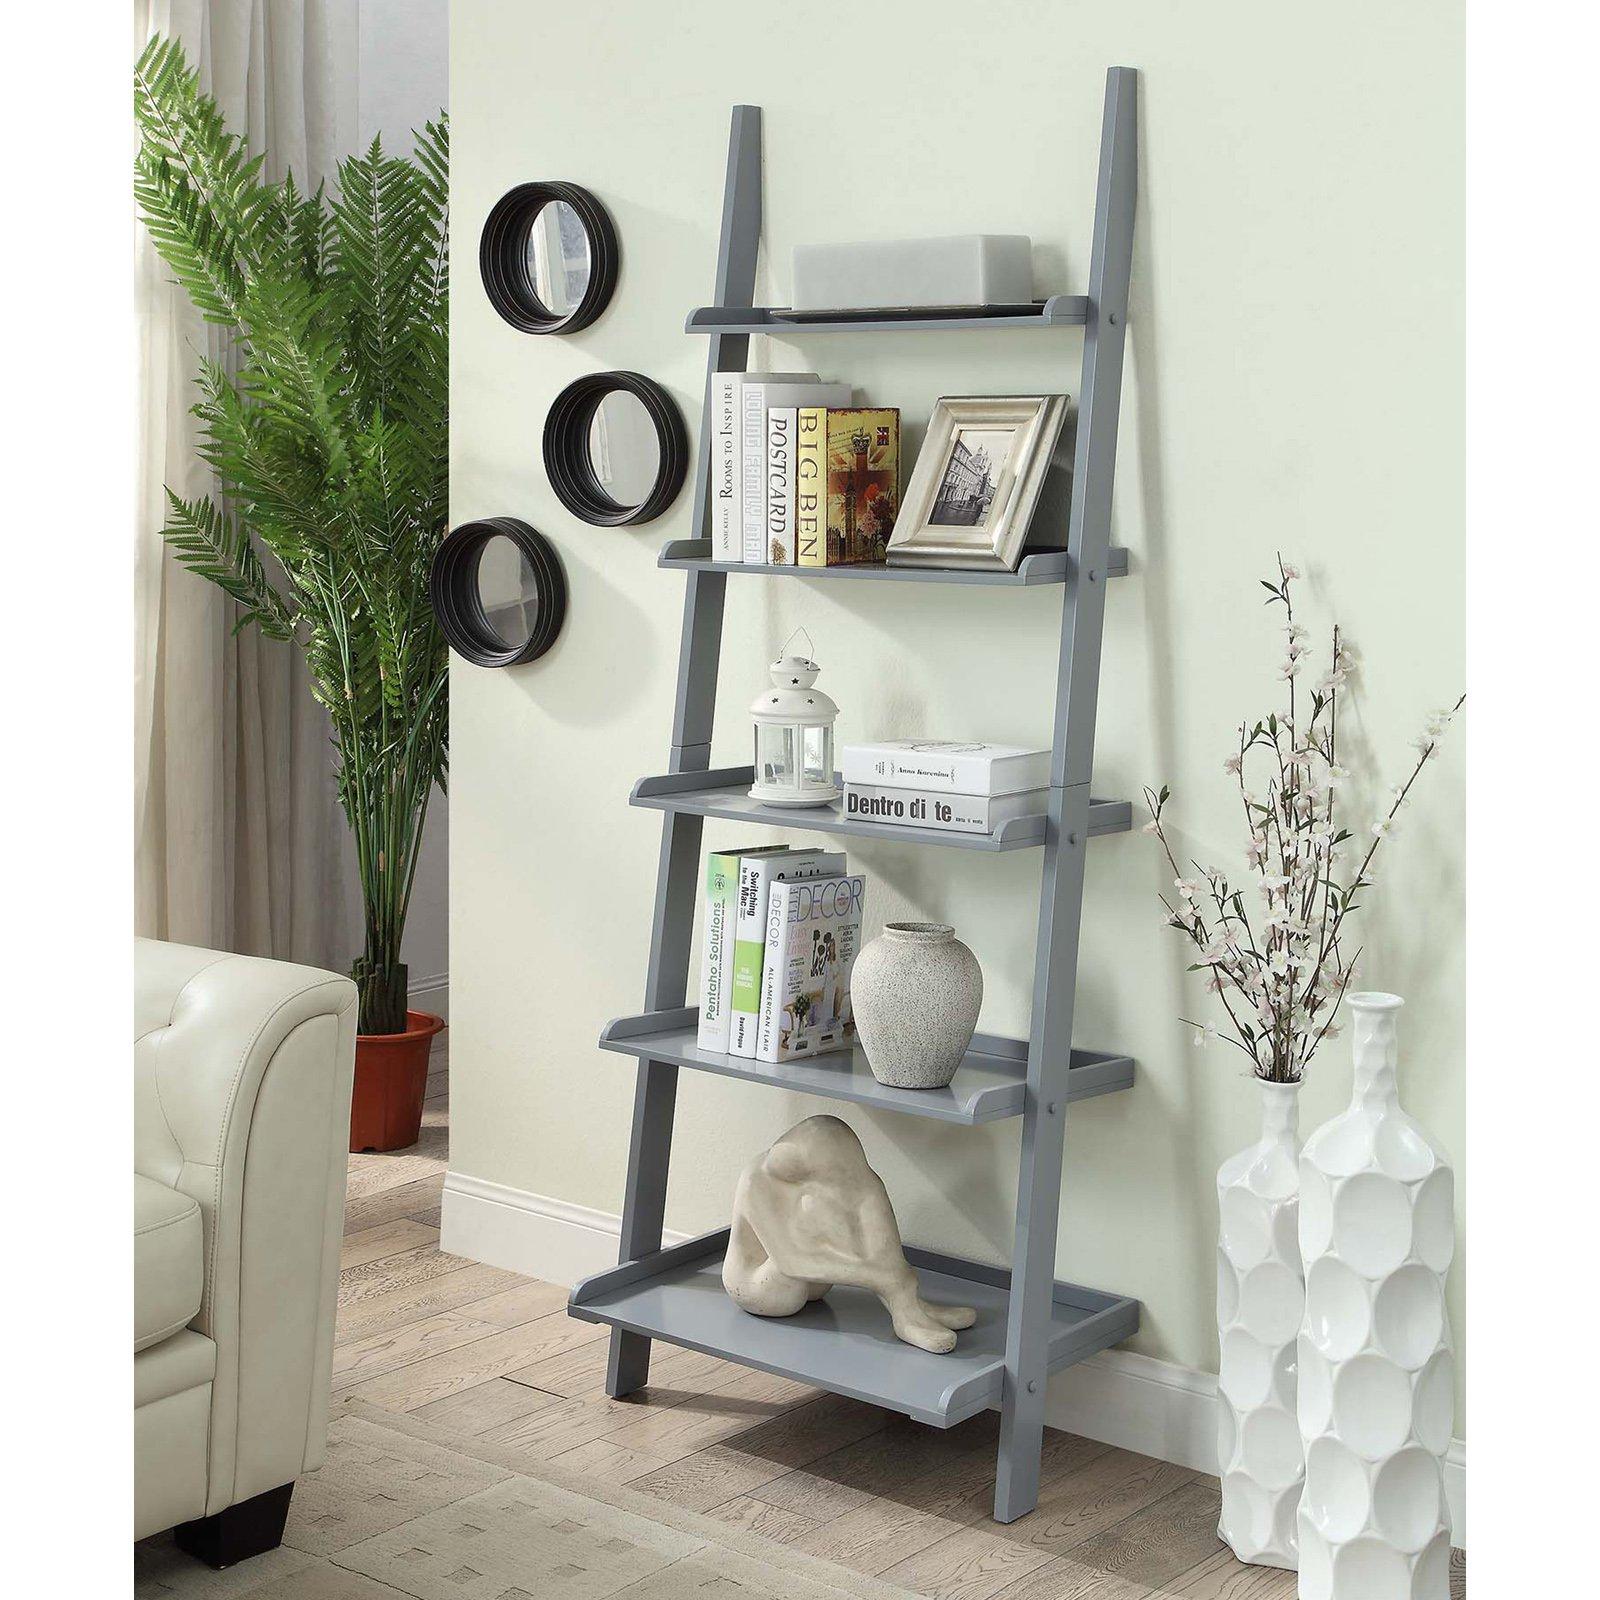 Convenience Concepts American Heritage 5-Shelf Bookshelf Ladder, Multiple Finishes